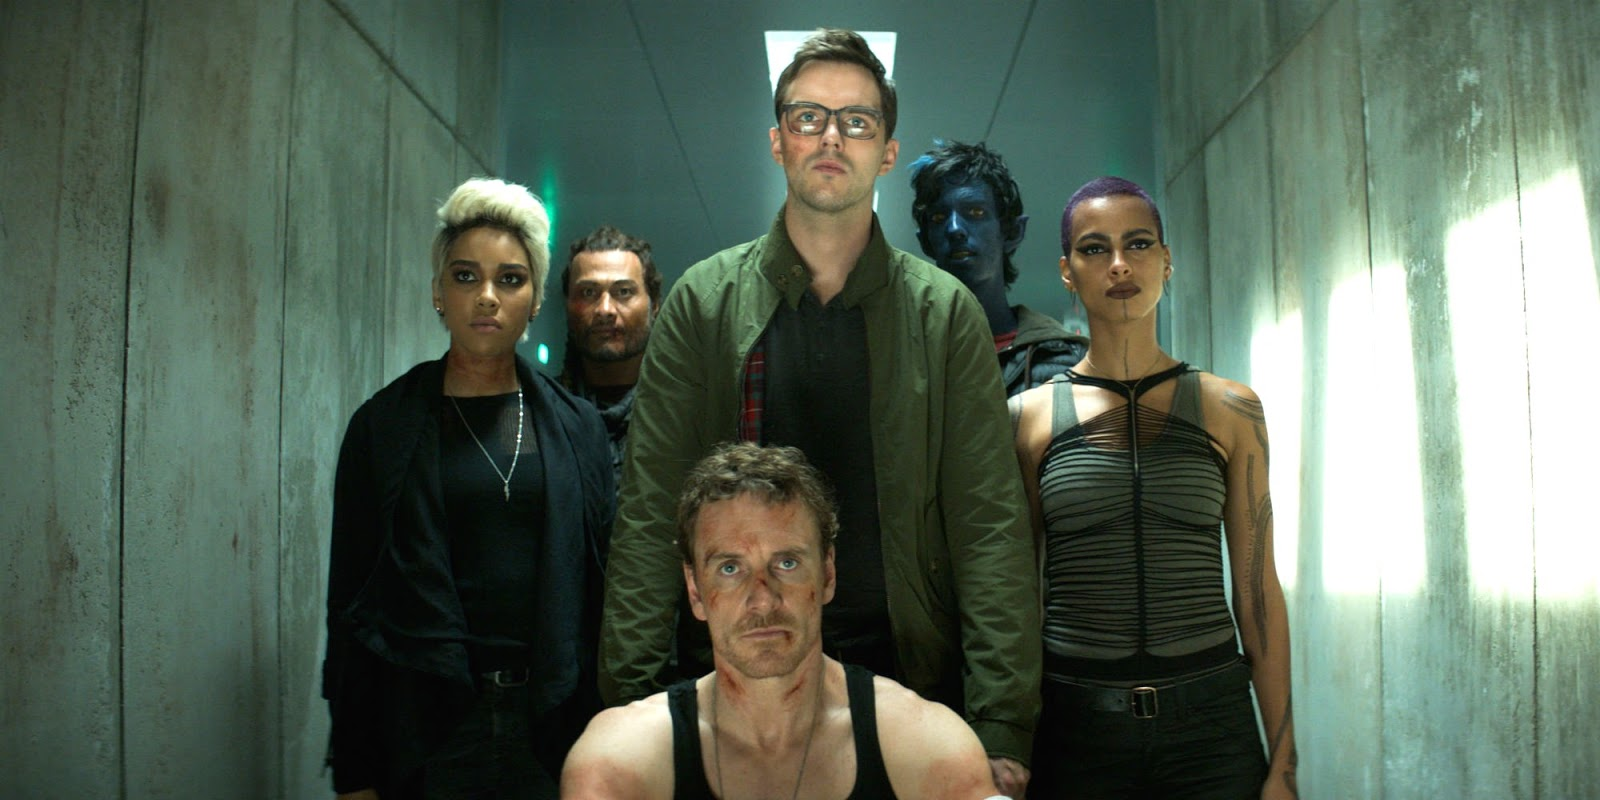 'Dark Phoenix' Movie Review: Say goodbye to the X-Men